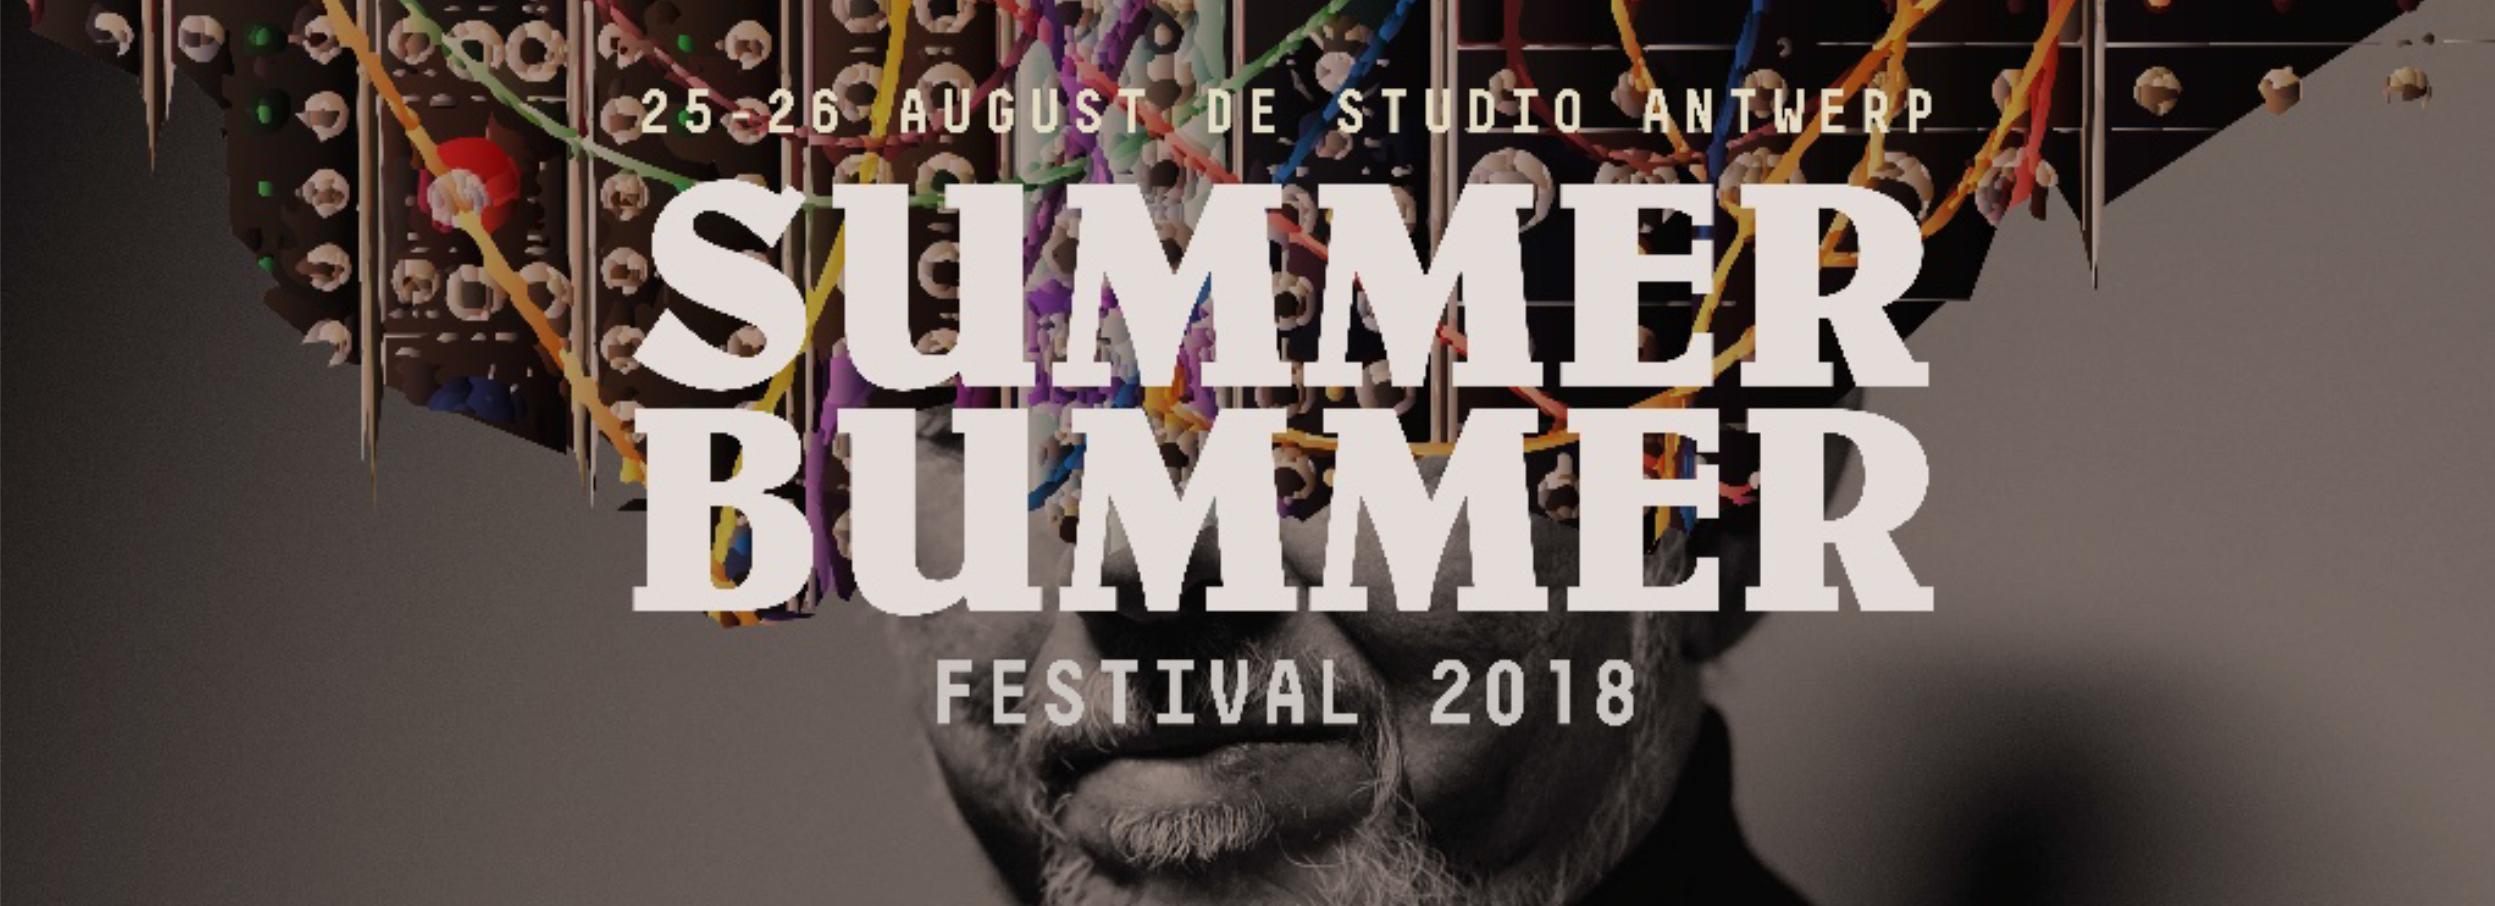 SUMMER BUMMER FESTIVAL 2018 – LAST REMINDER